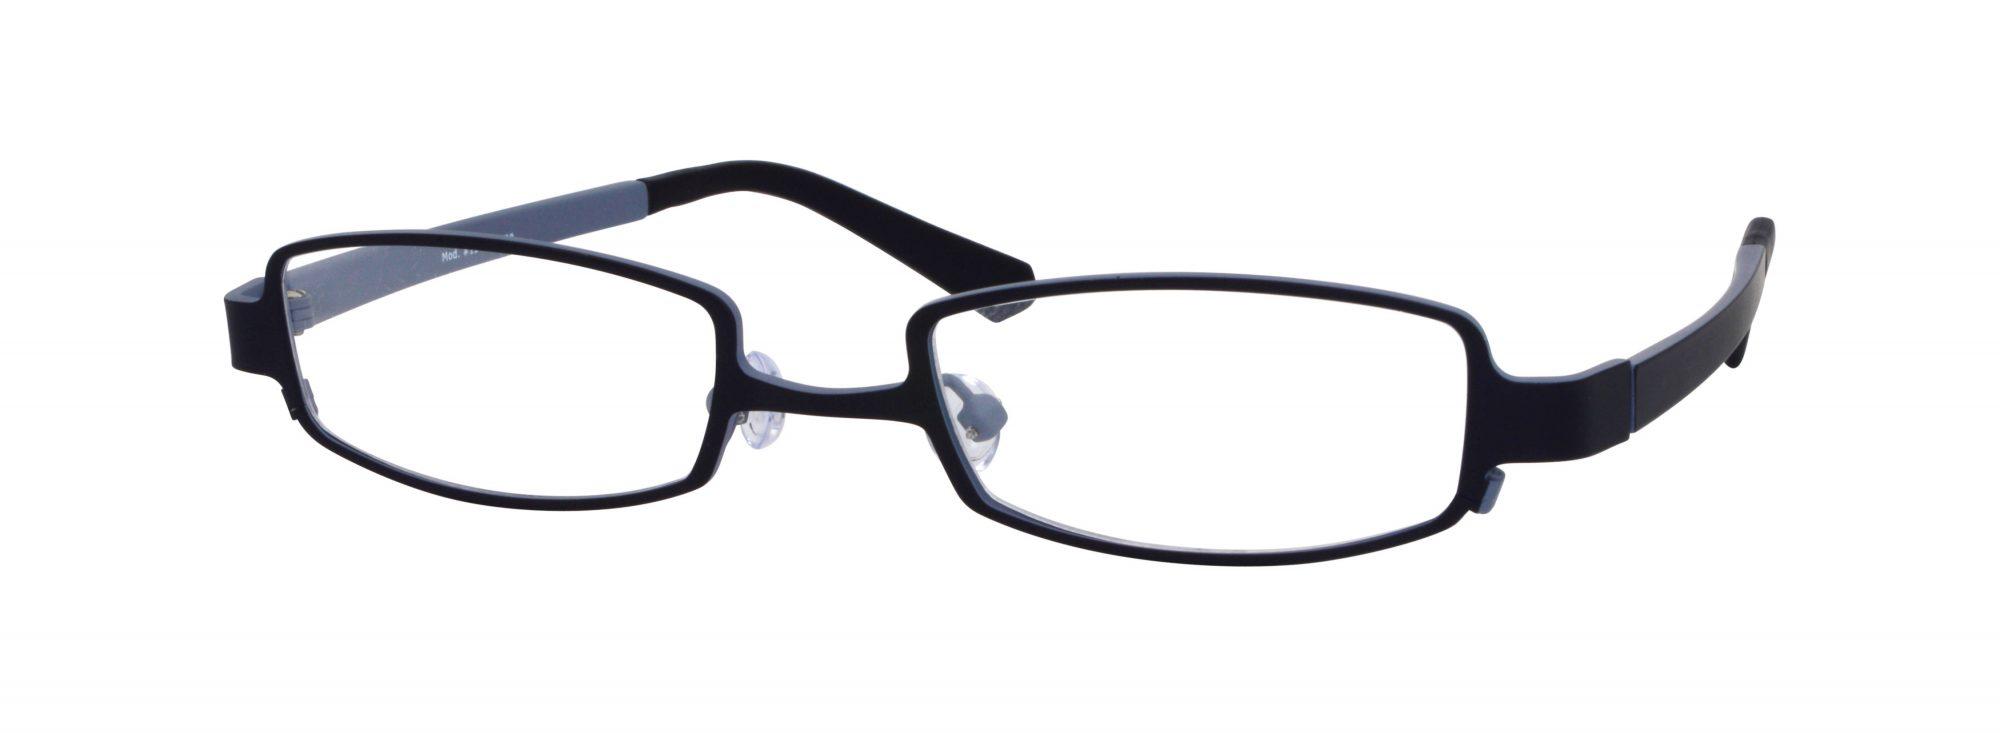 Erin's World frame style number EW-15 in black and gray matt